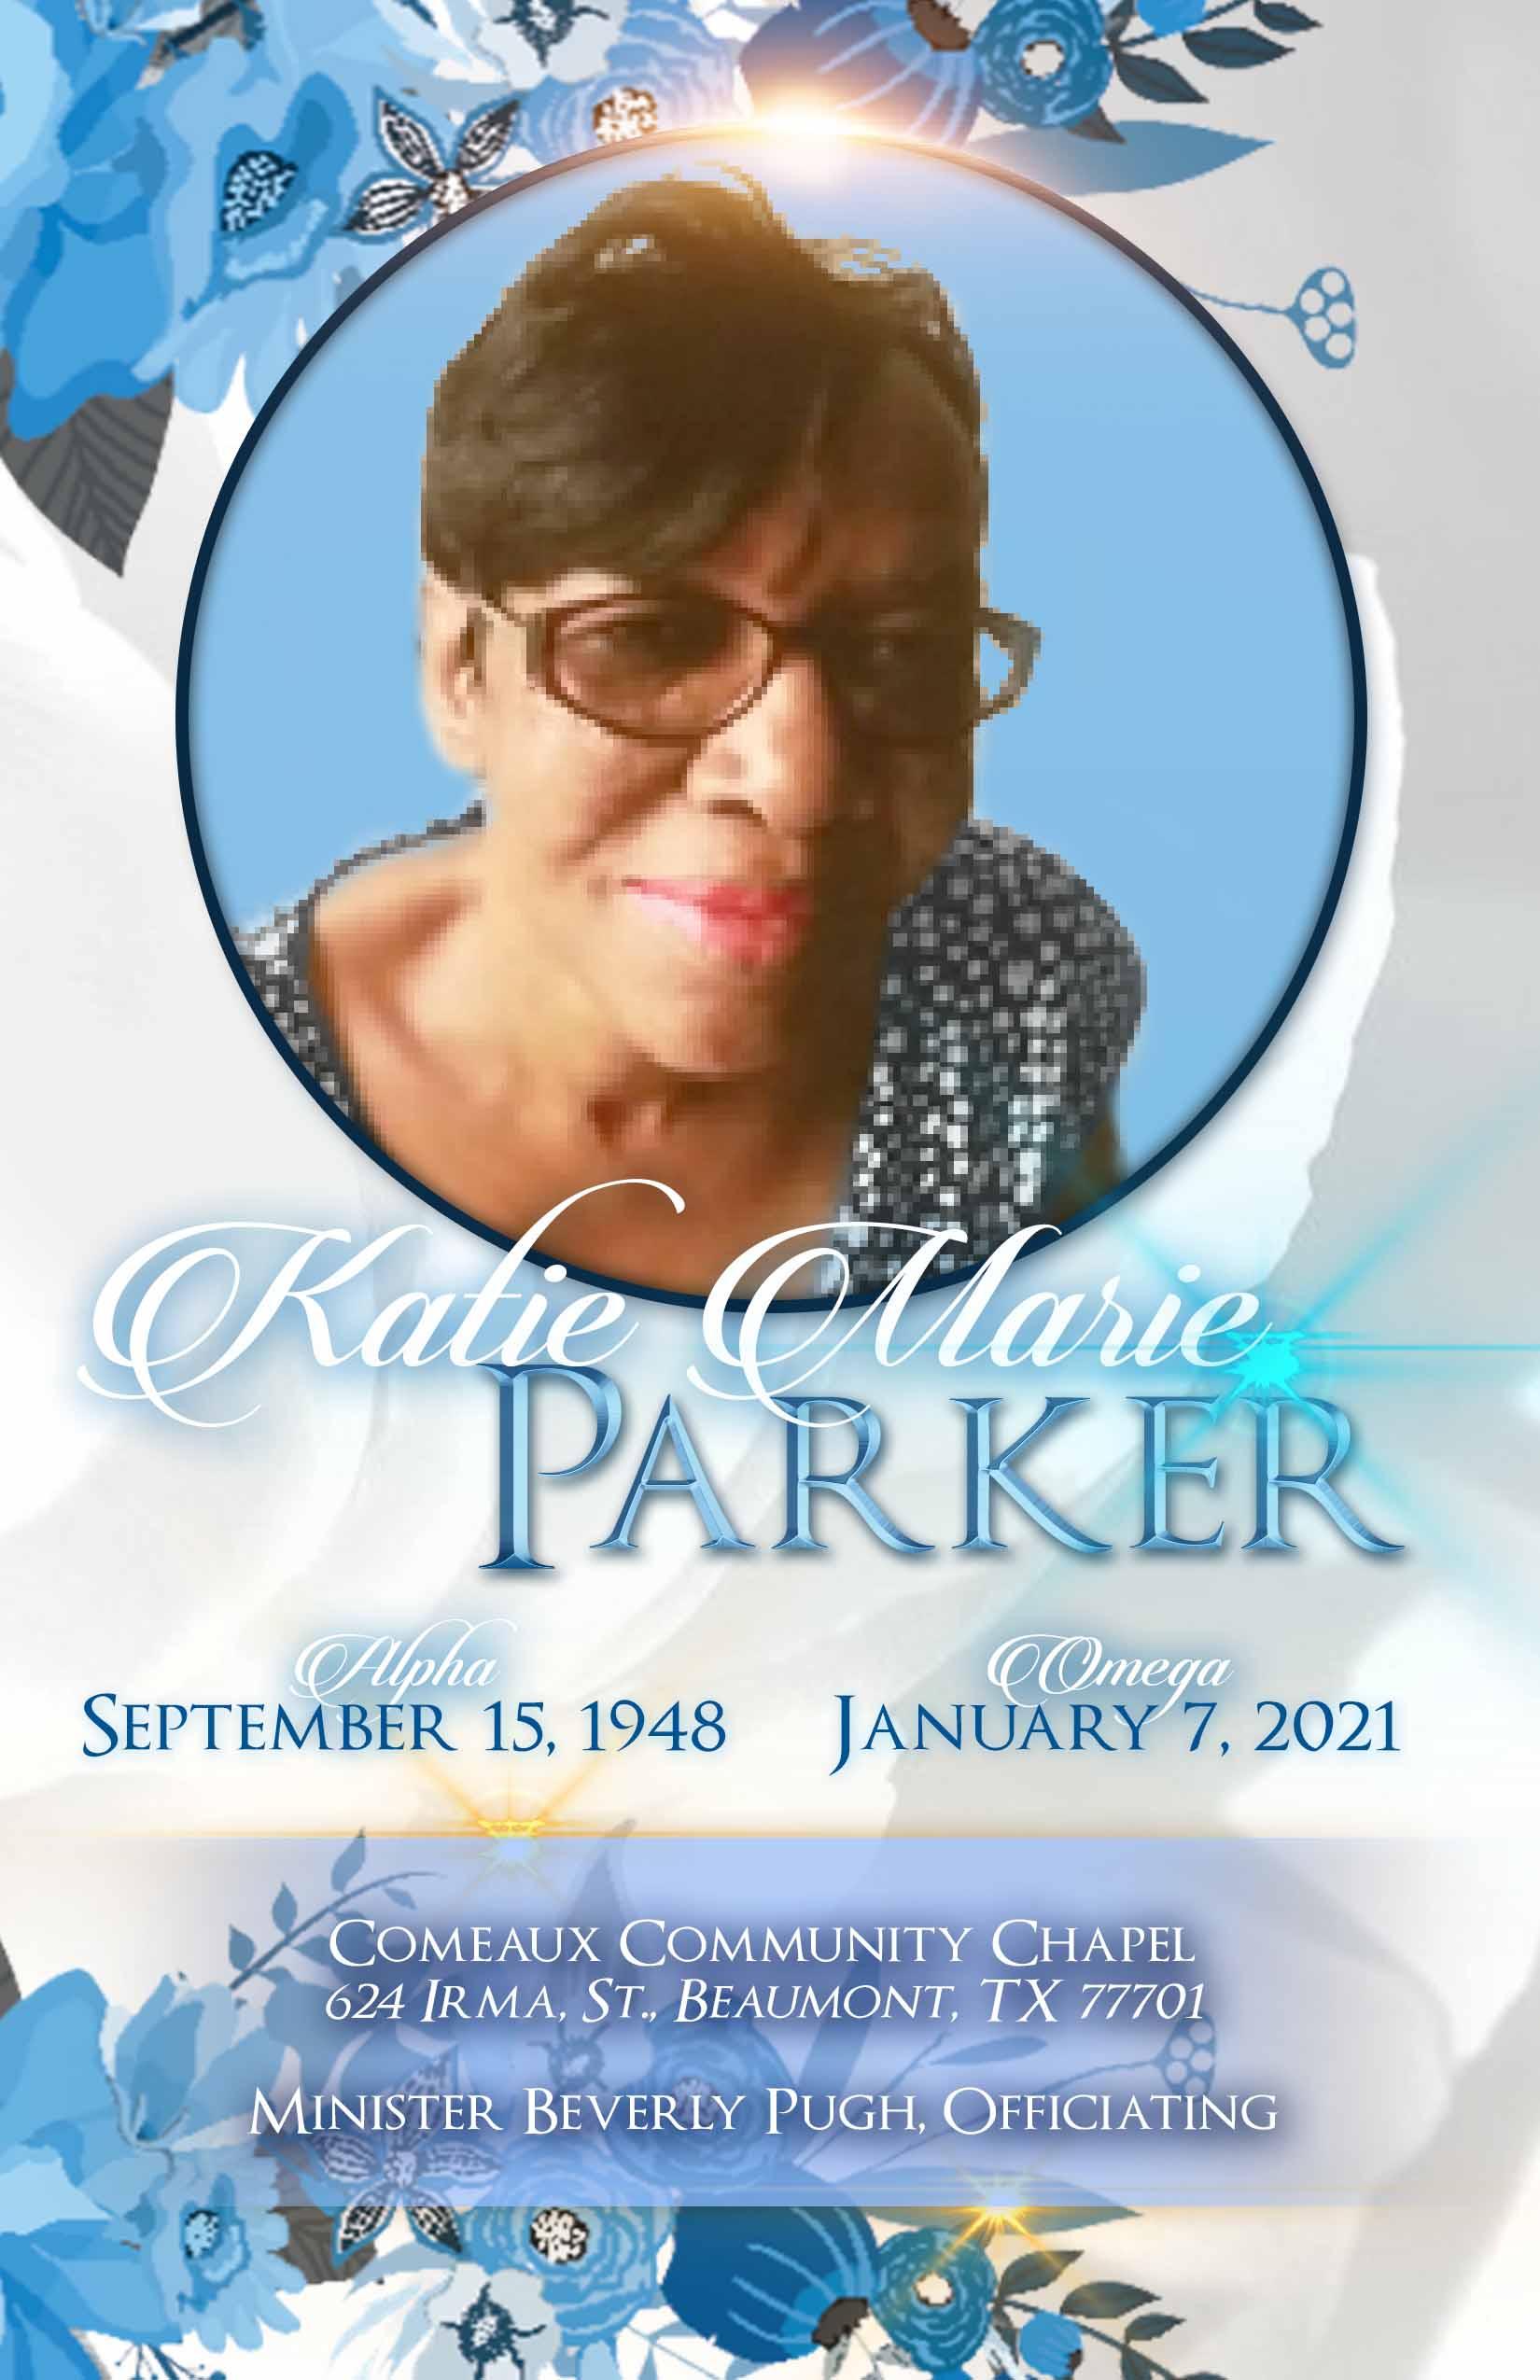 Katie Marie Parker 1948-2021